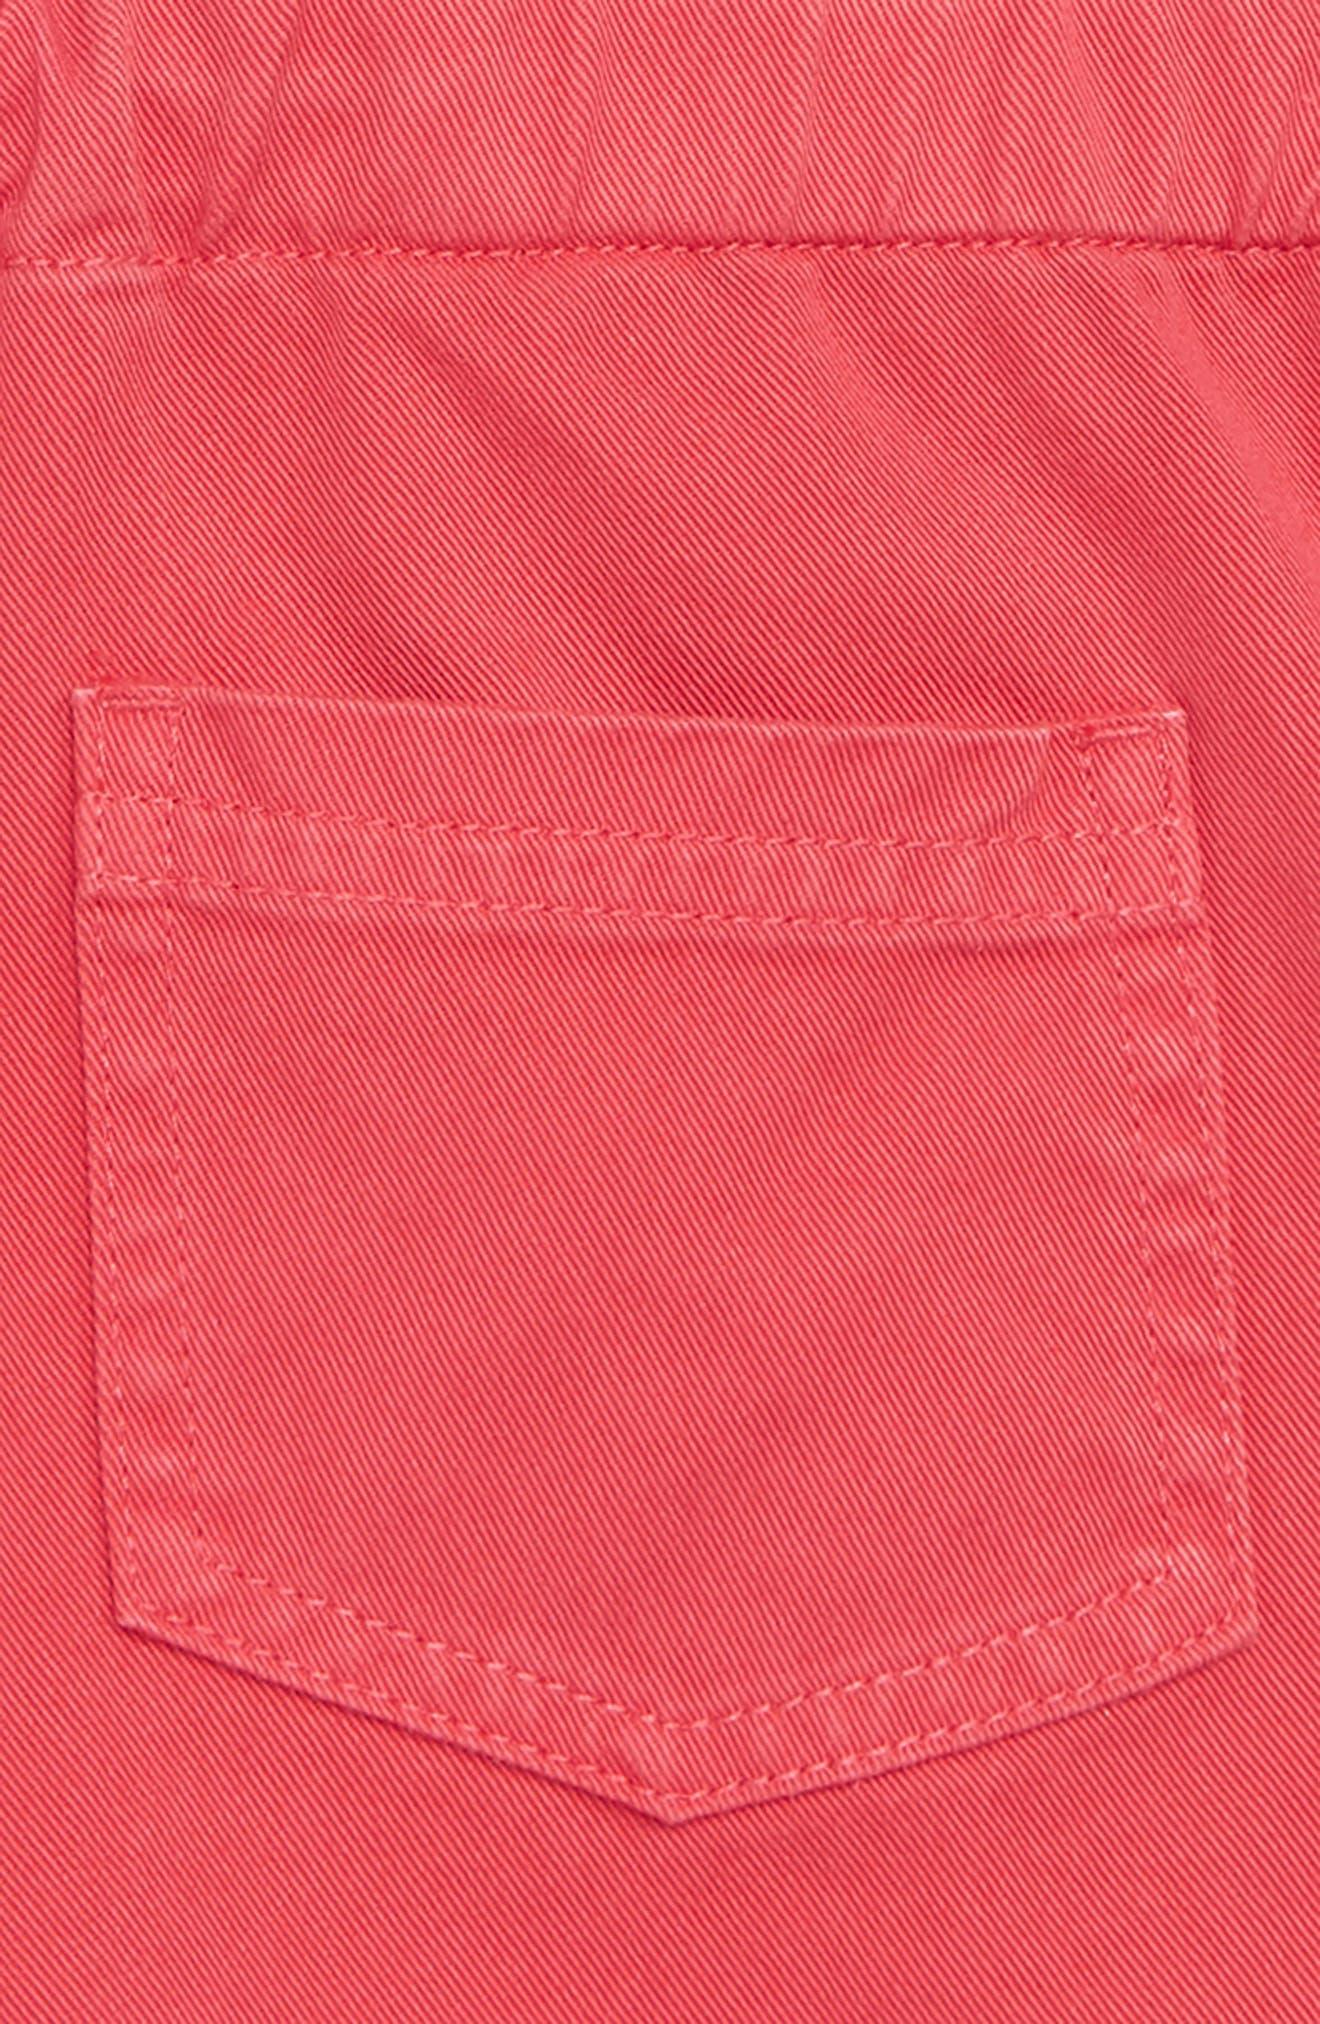 Frill Detail Shorts,                             Alternate thumbnail 3, color,                             664